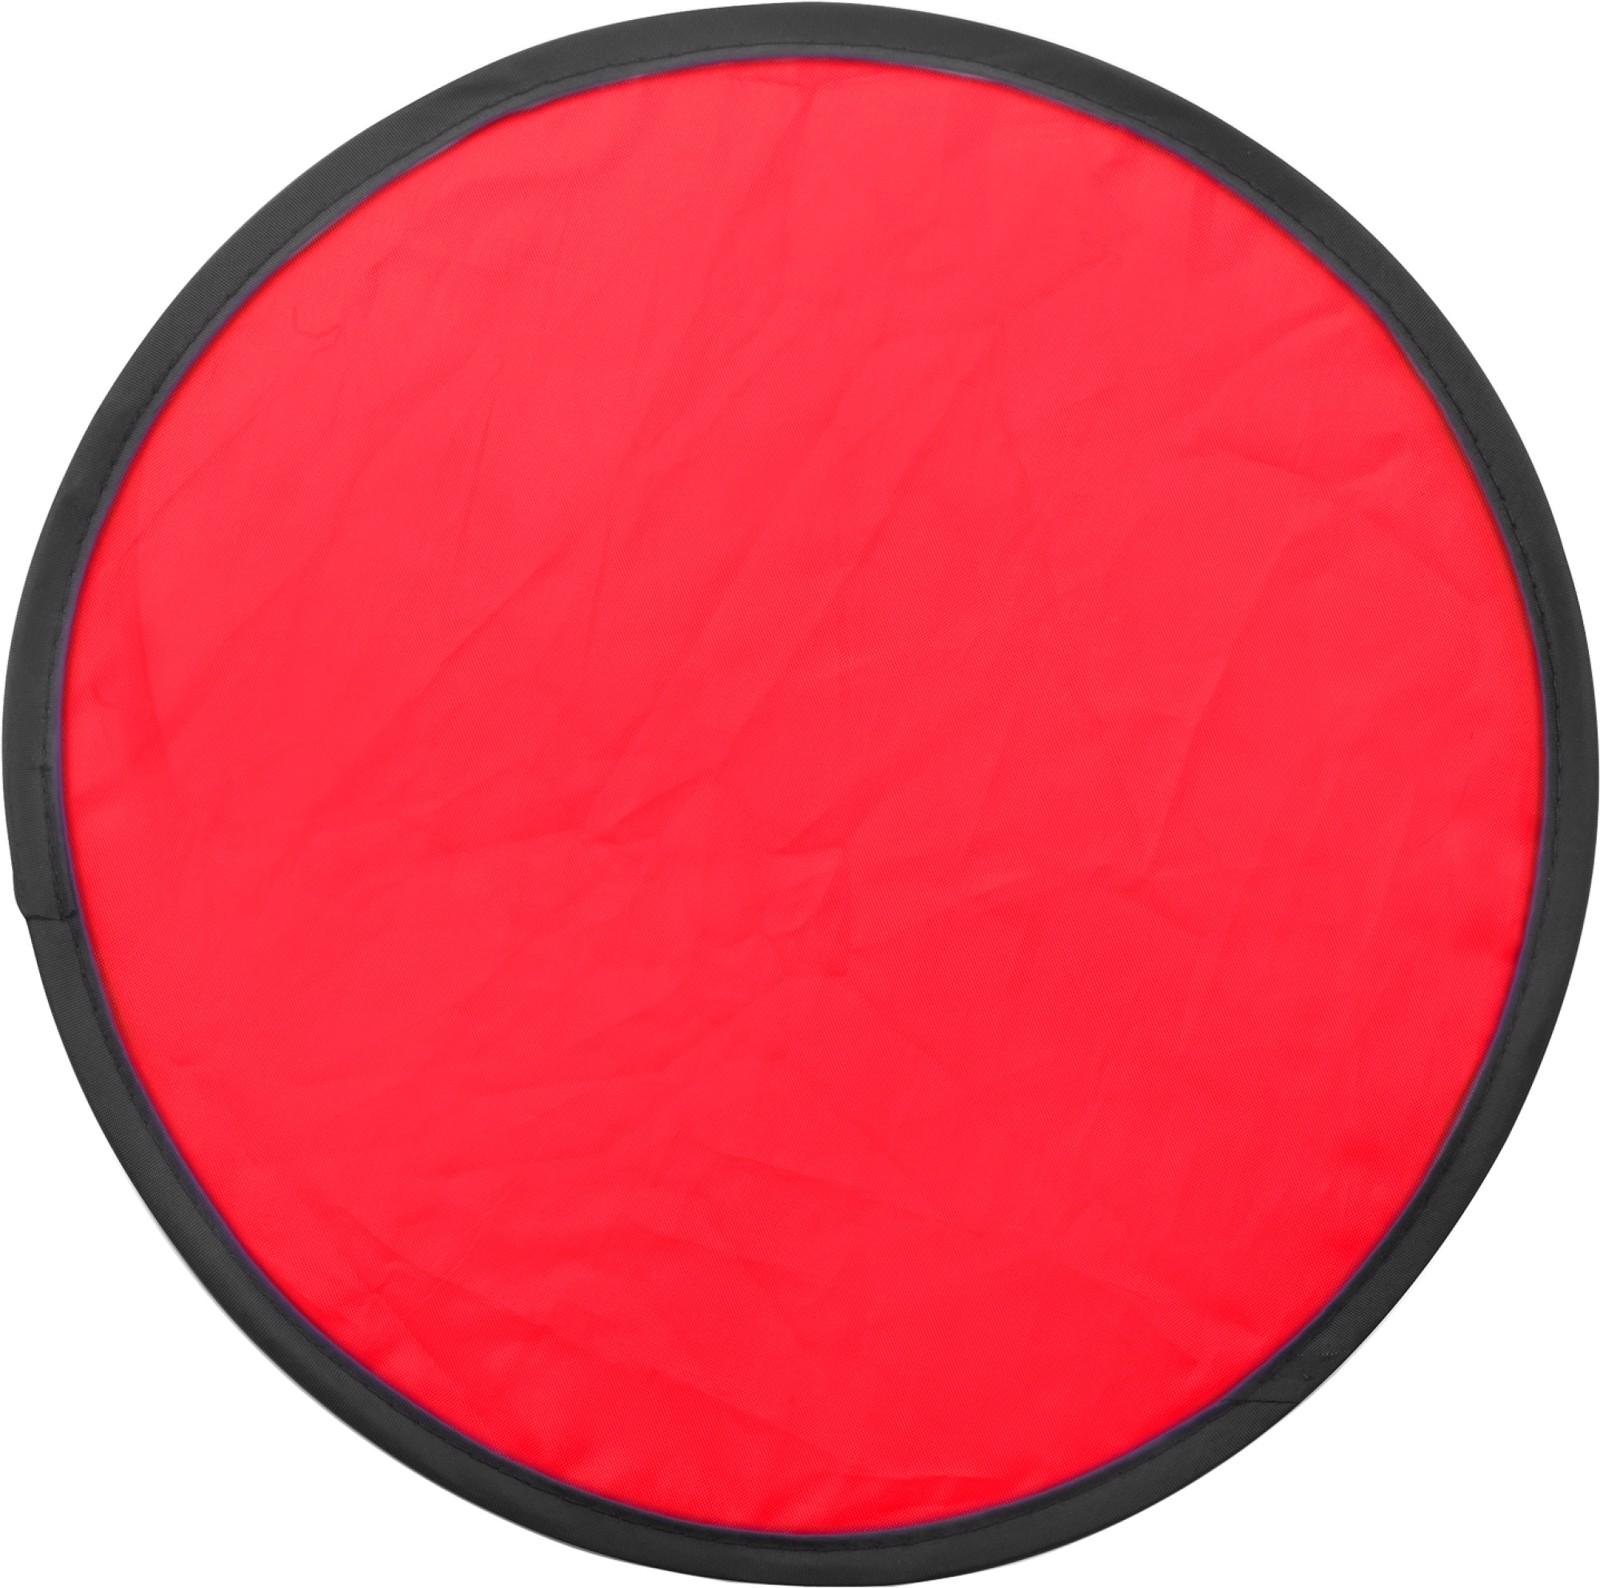 Nylon (170T) Frisbee - Red